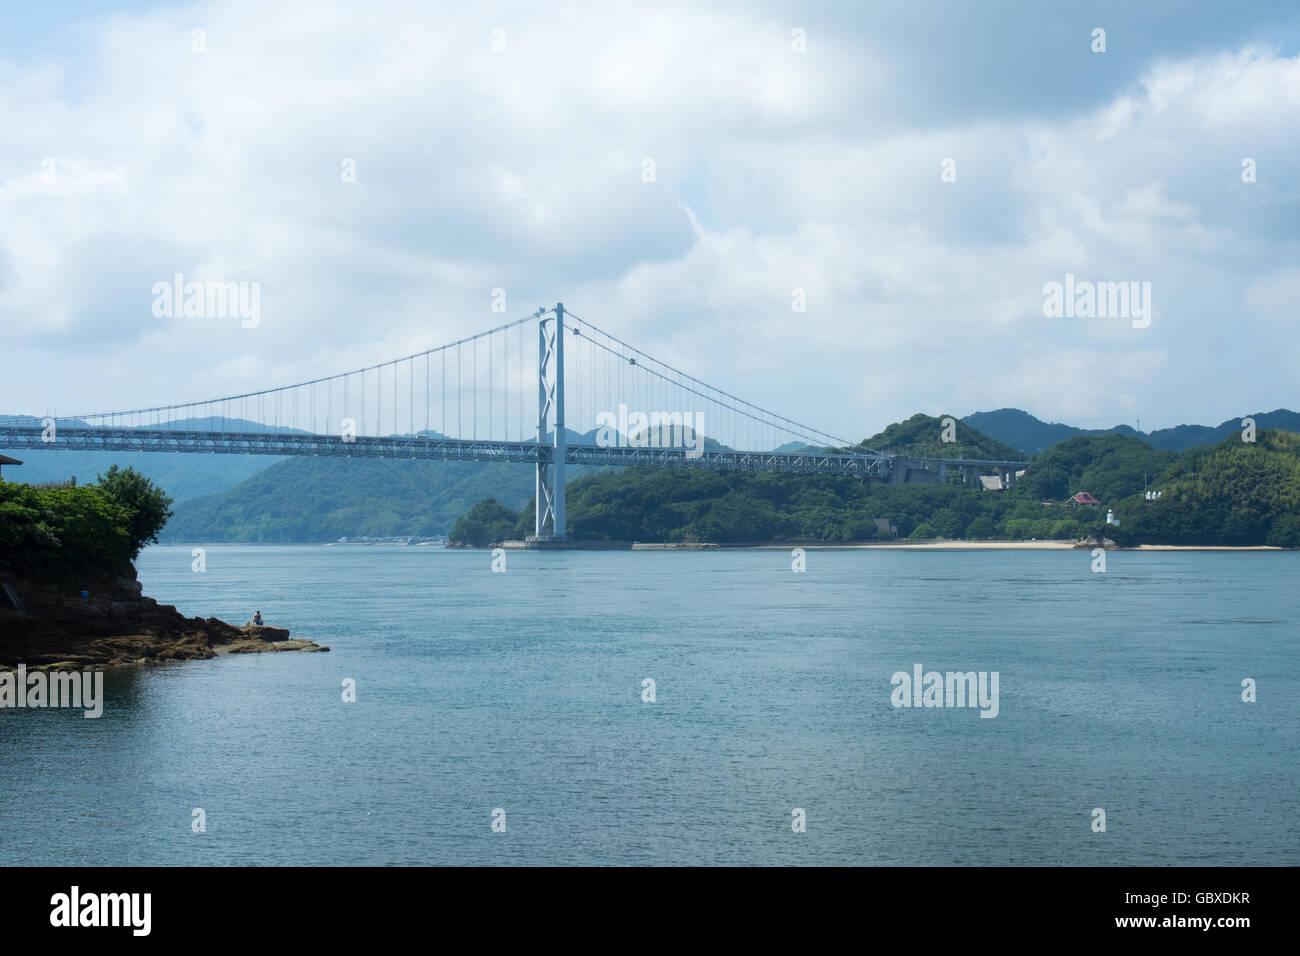 Innoshima Bridge connecting the islands of Innoshima and Mukaishima in the Seto Inland Sea between Honshu and Shikoku. - Stock Image